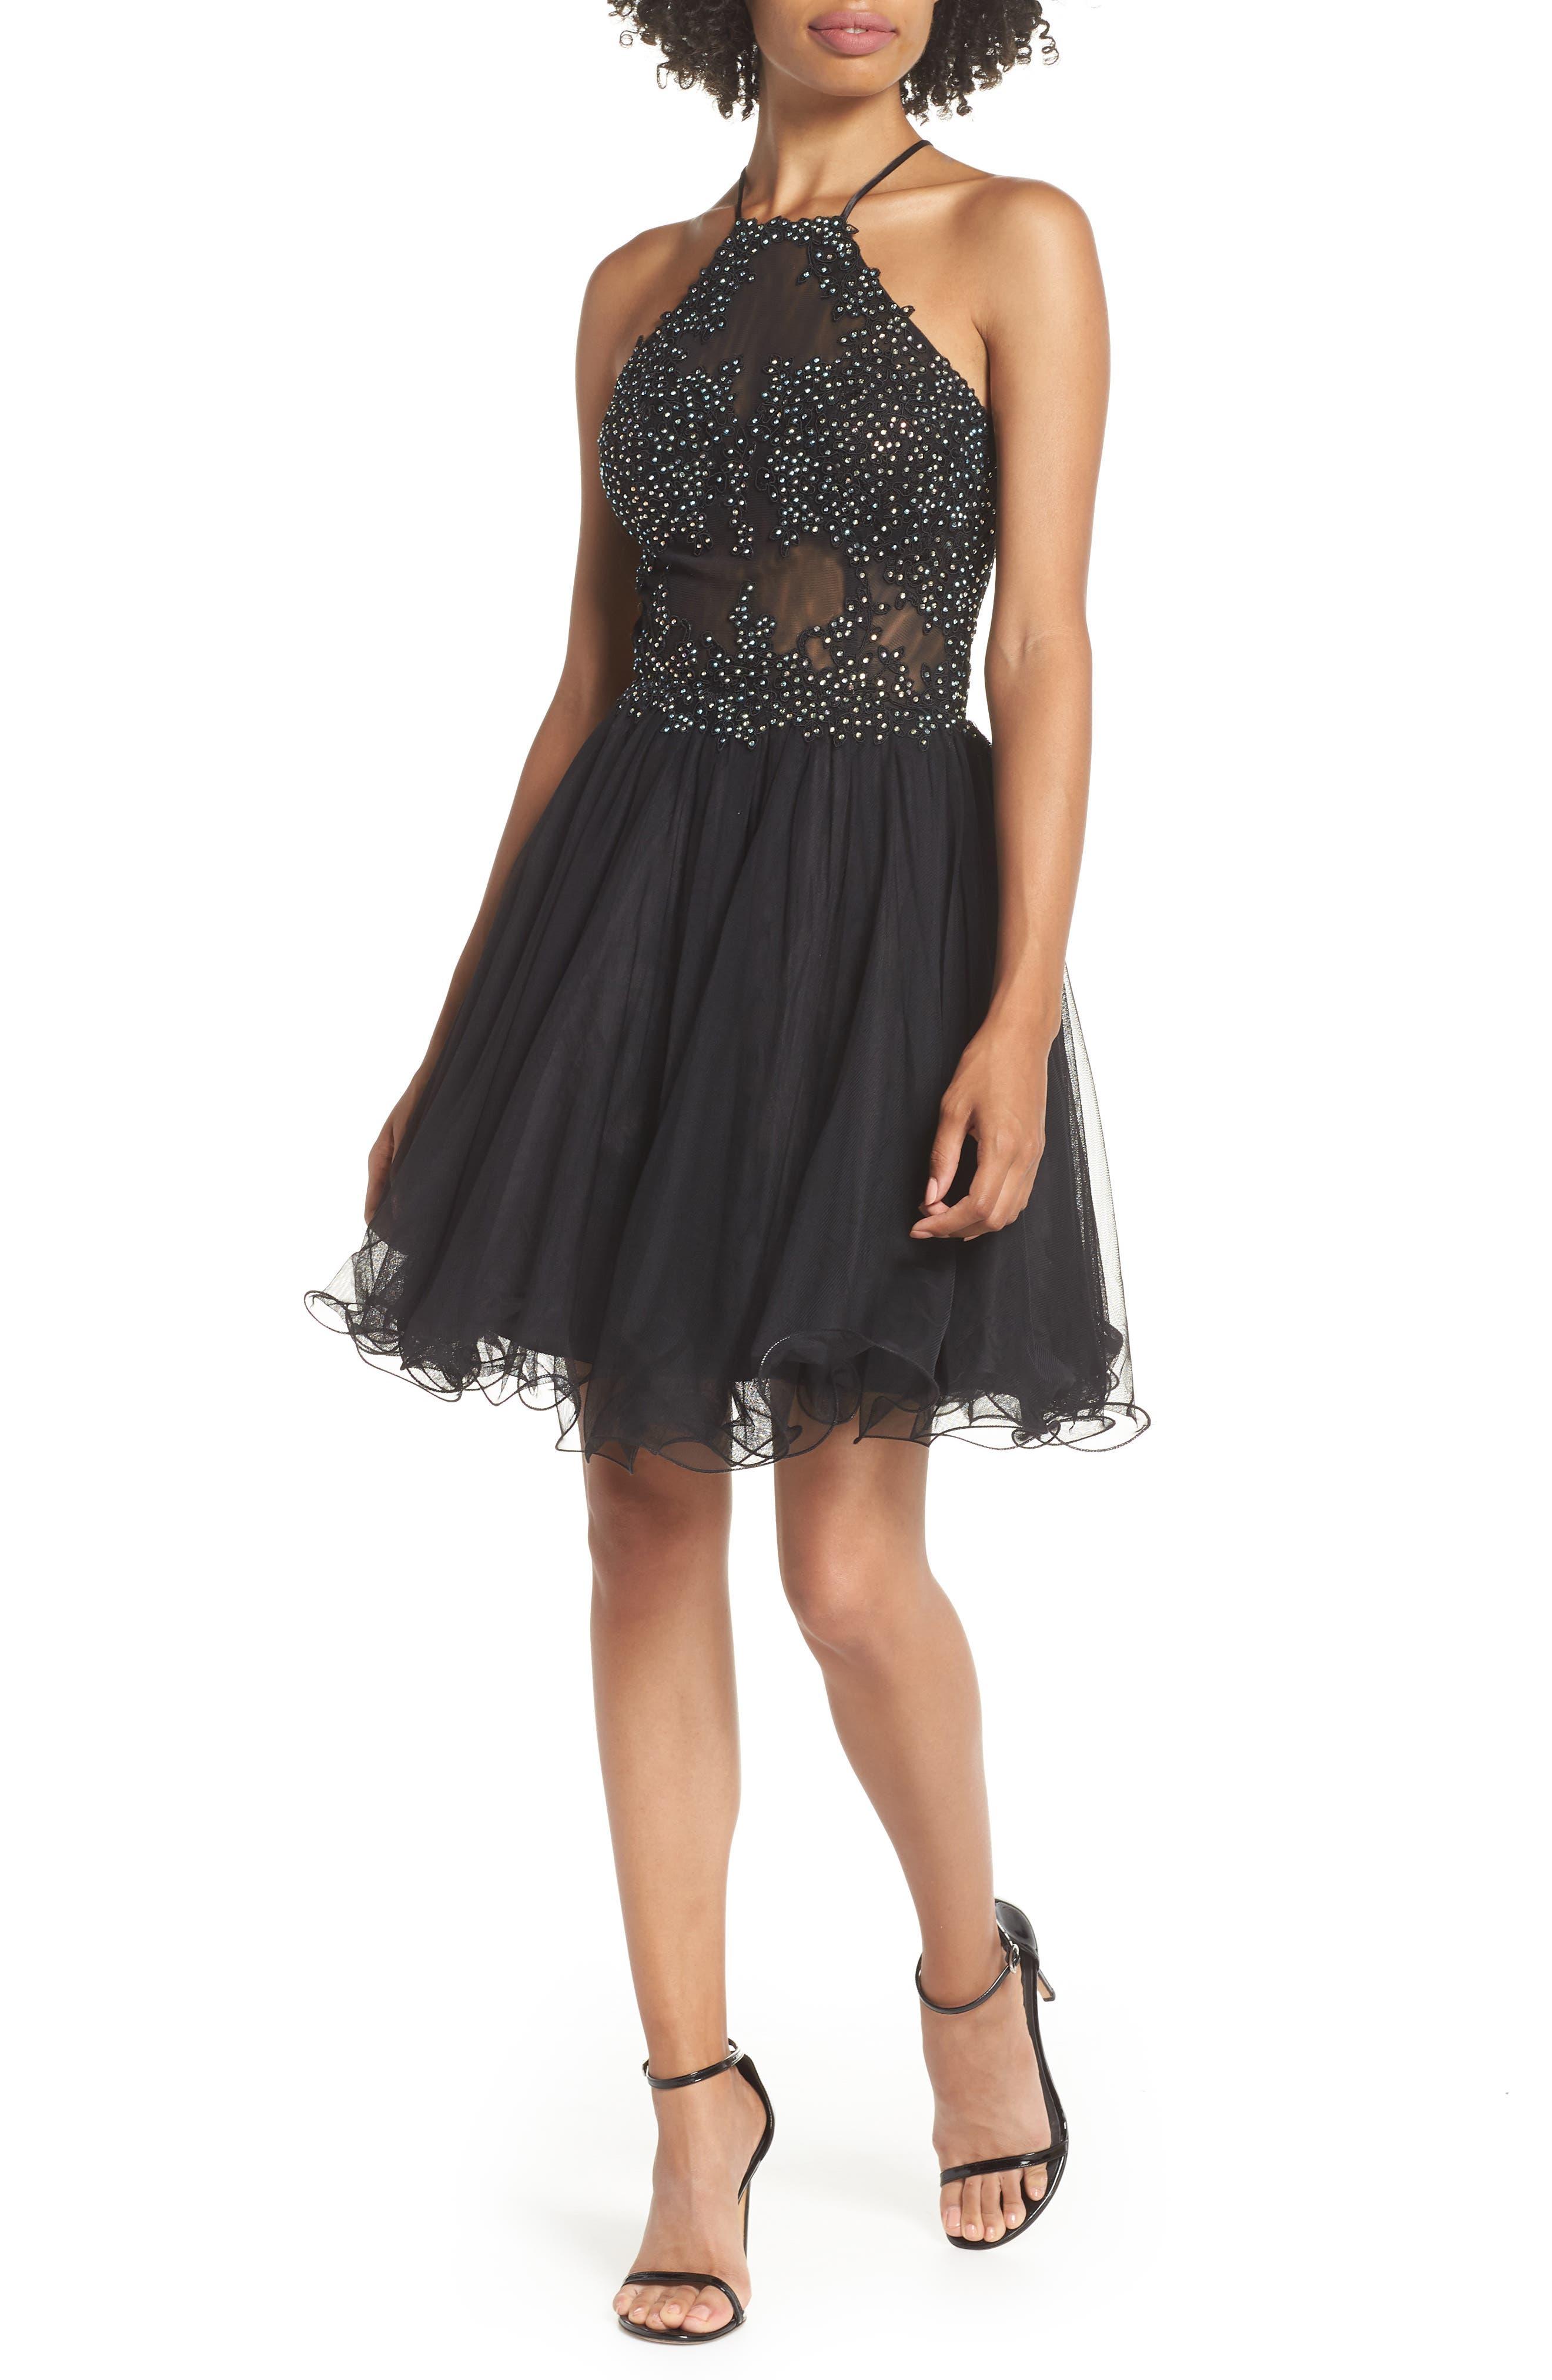 Blondie Nites Halter Neck Applique Mesh Party Dress, Black